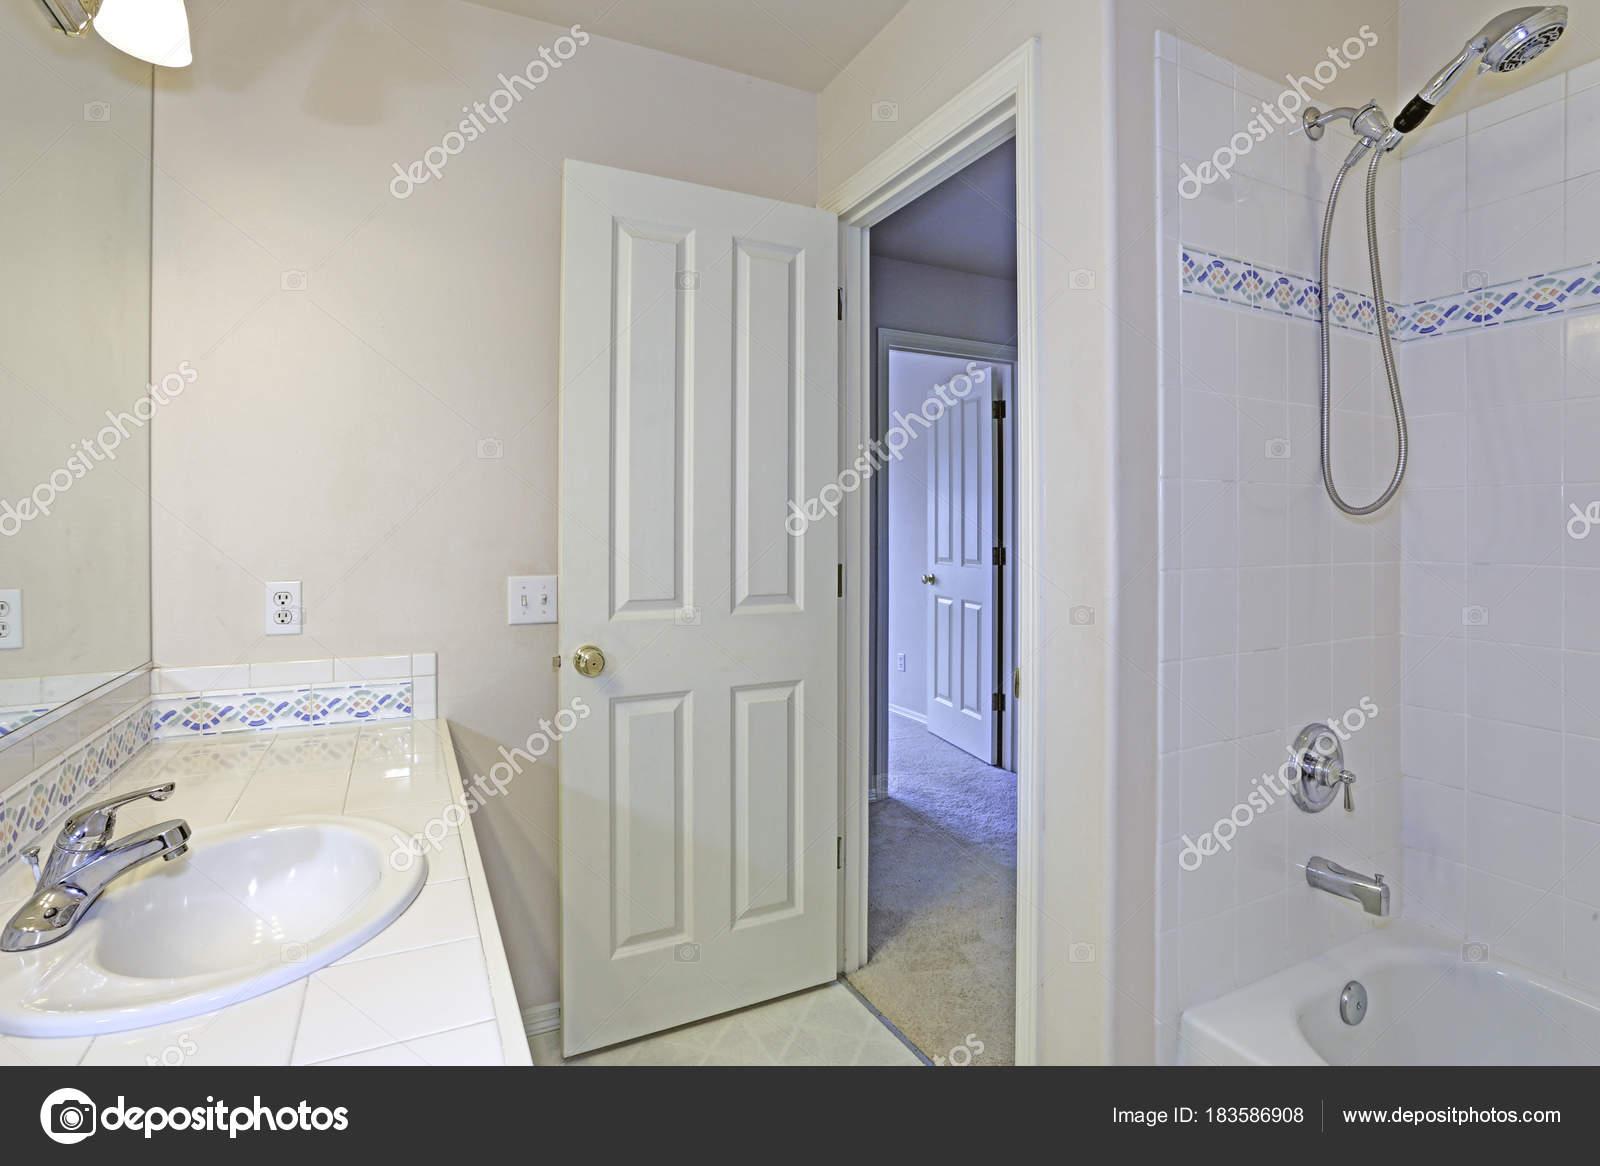 Interno del bagno bianco con piastrelle a mosaico backspalsh